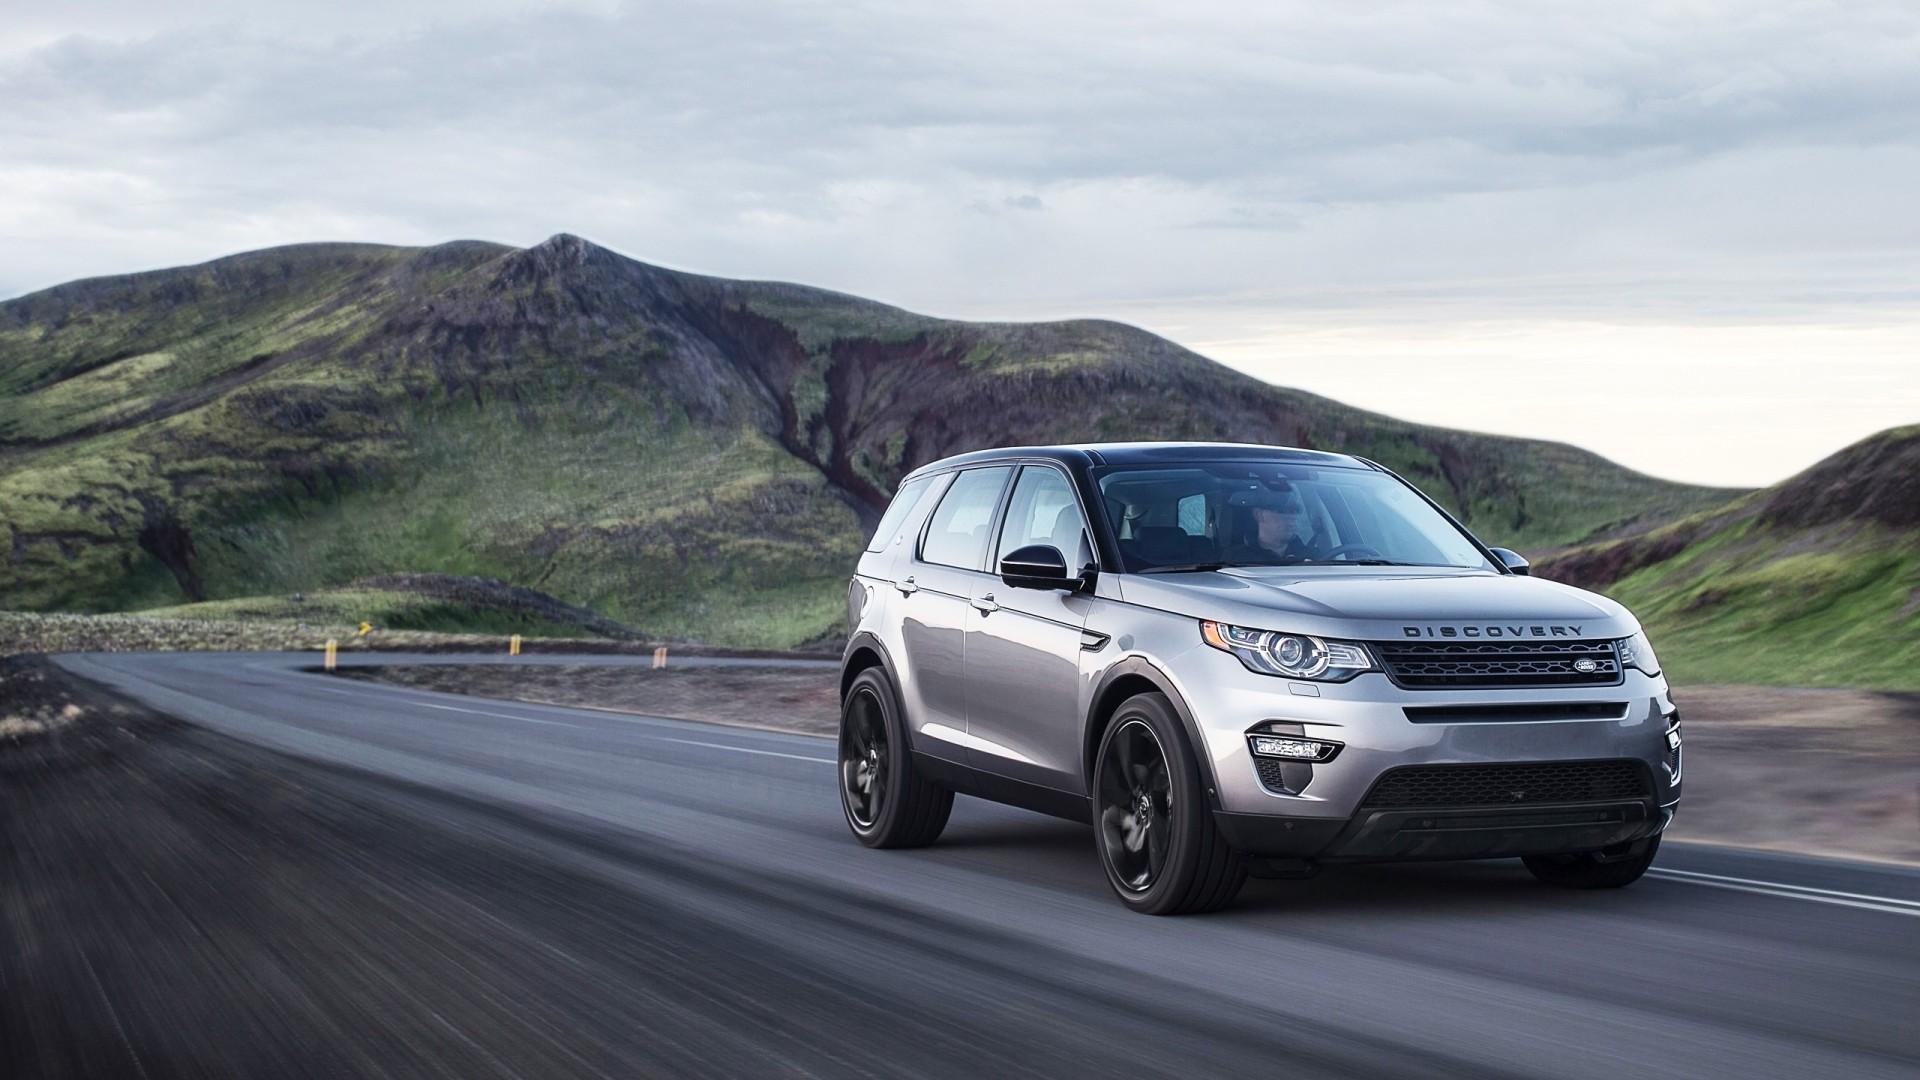 Range Rover Evoque >> 2015 Land Rover Discovery Sport Wallpaper | HD Car ...